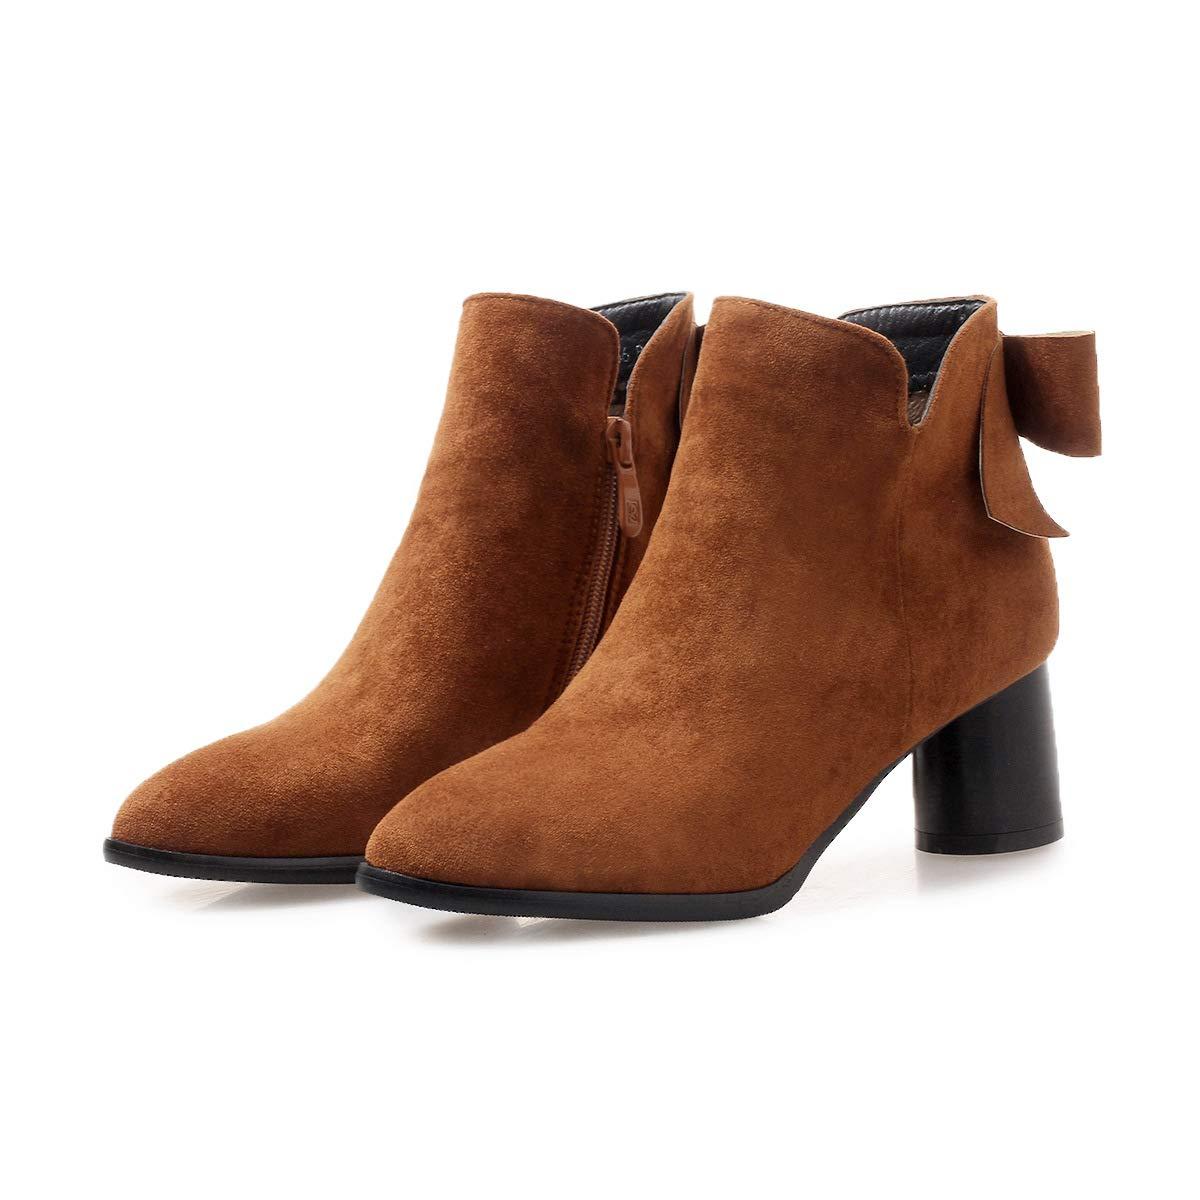 Woherren Pointed Toe Block Heels High Short Ankle Stiefel